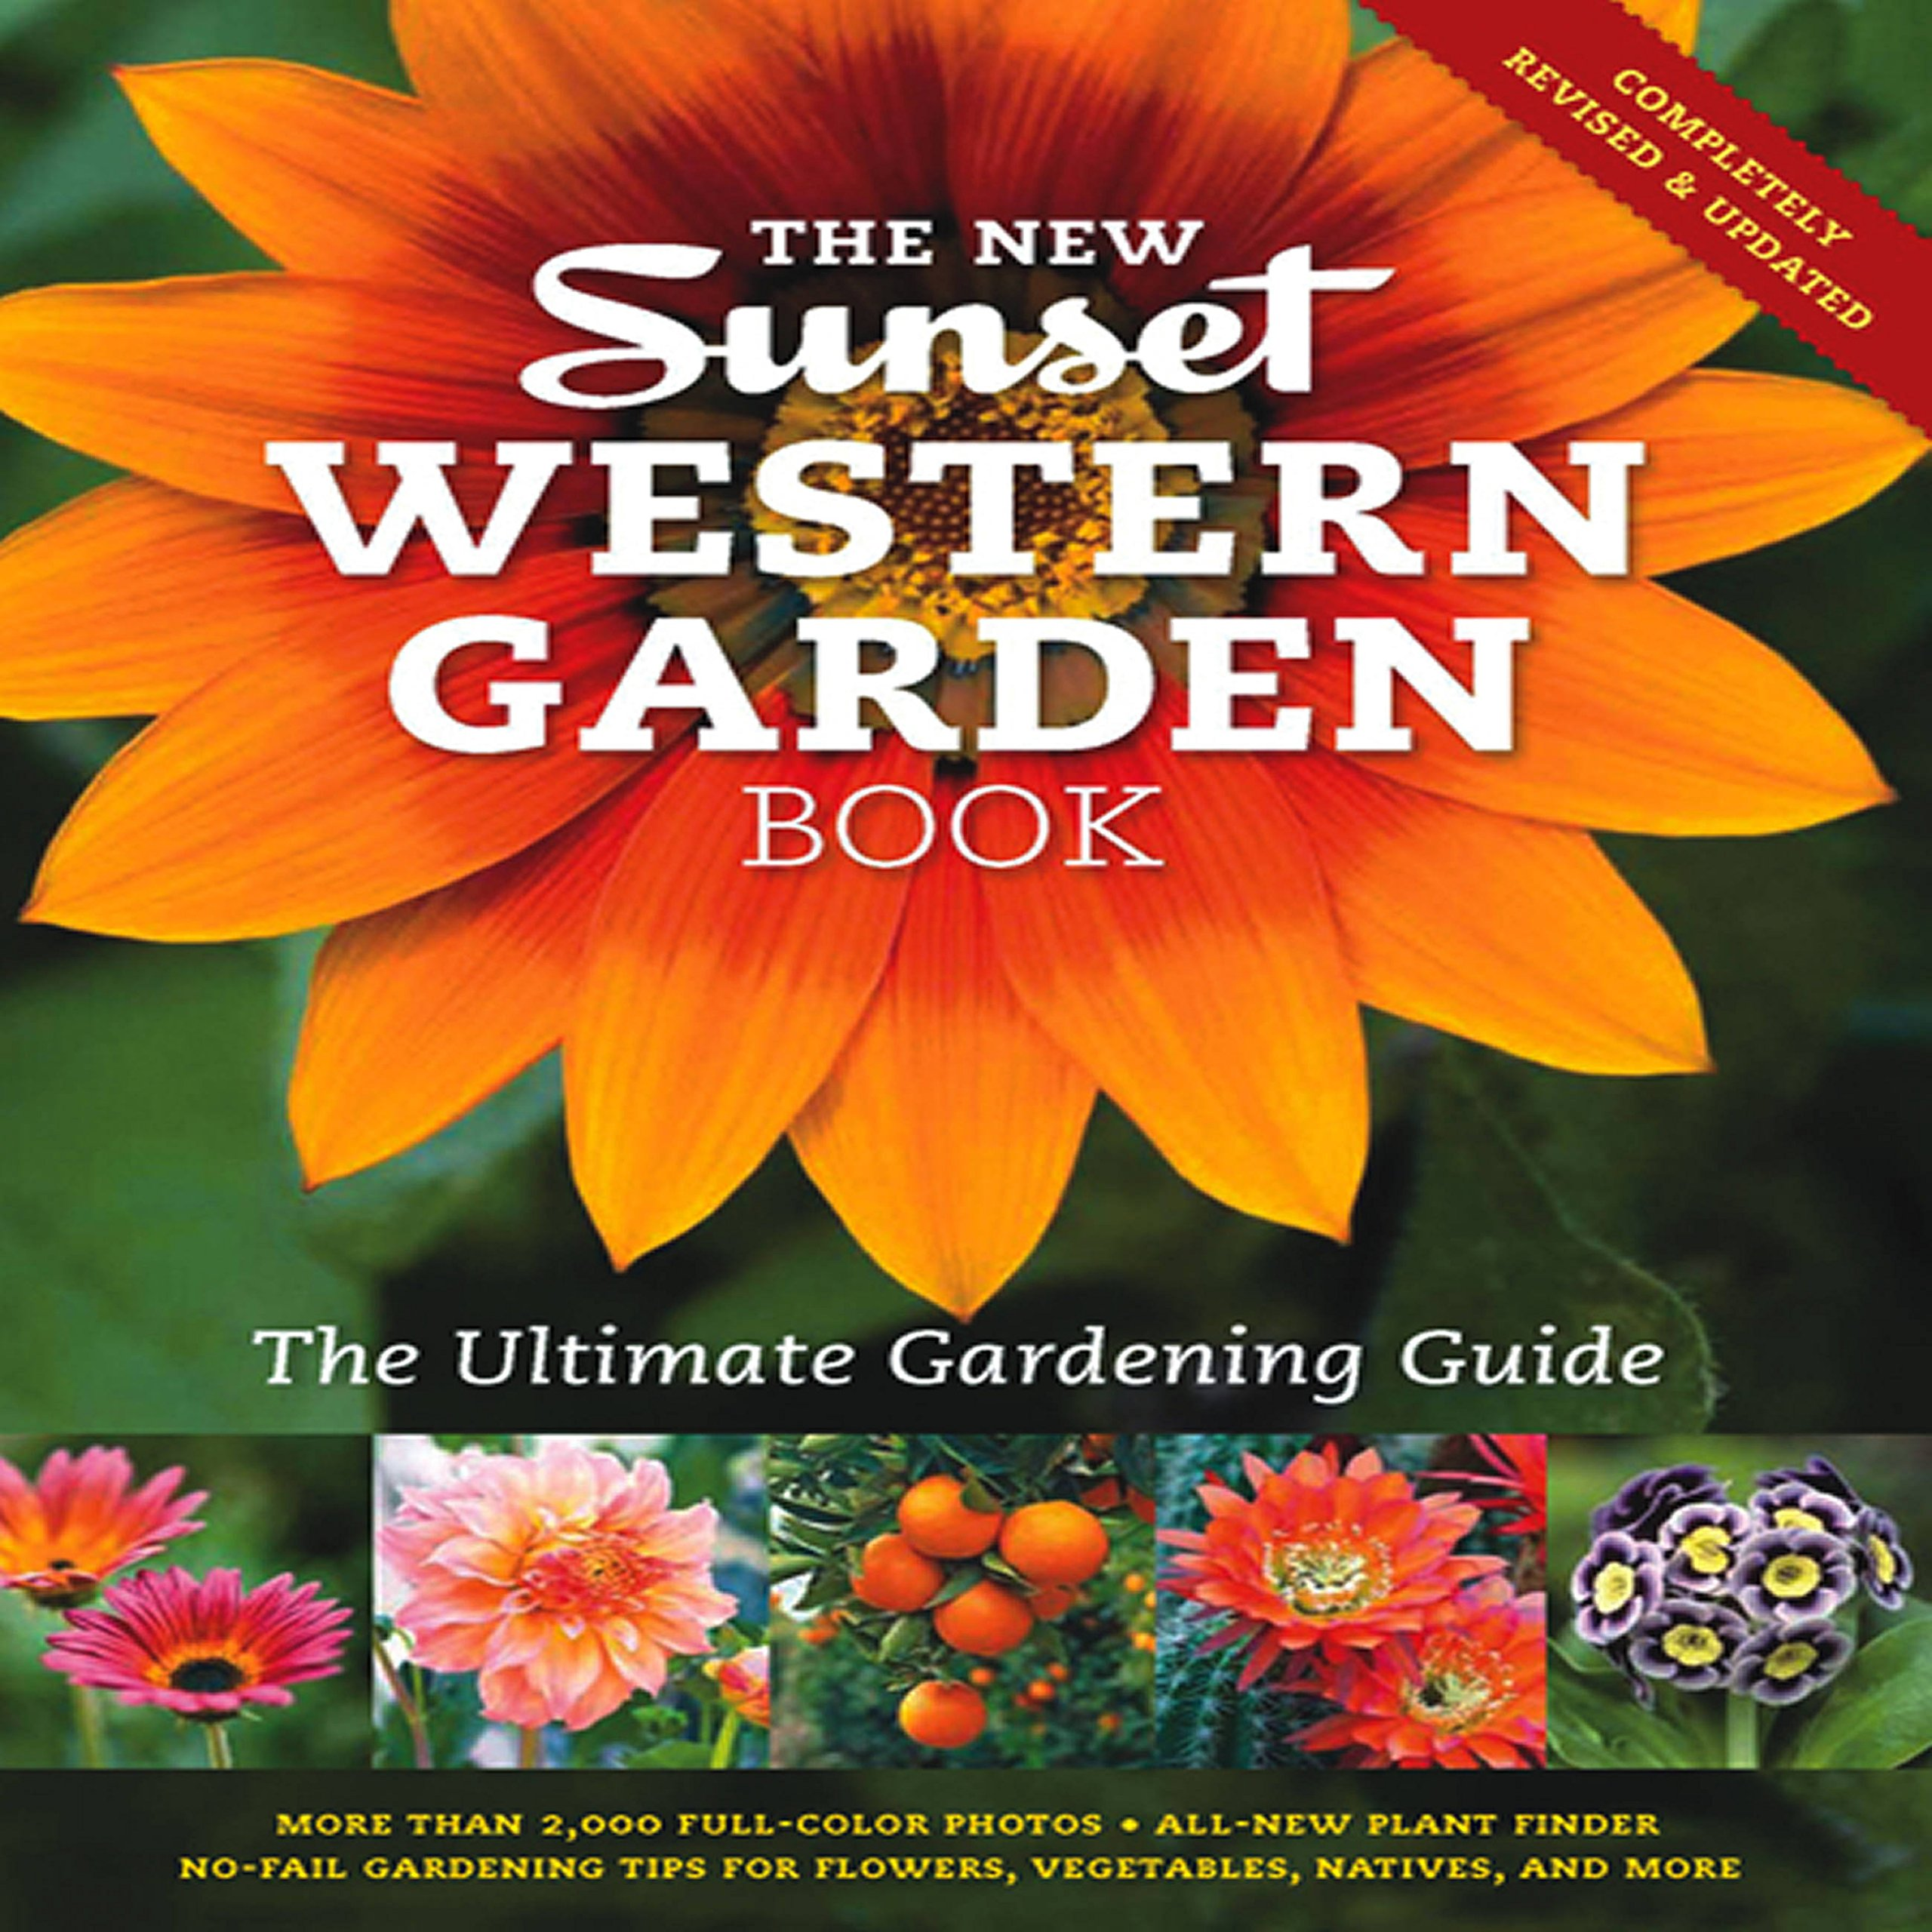 The New Western Garden Book: The Ultimate Gardening Guide (Sunset Western Garden Book (Paper))